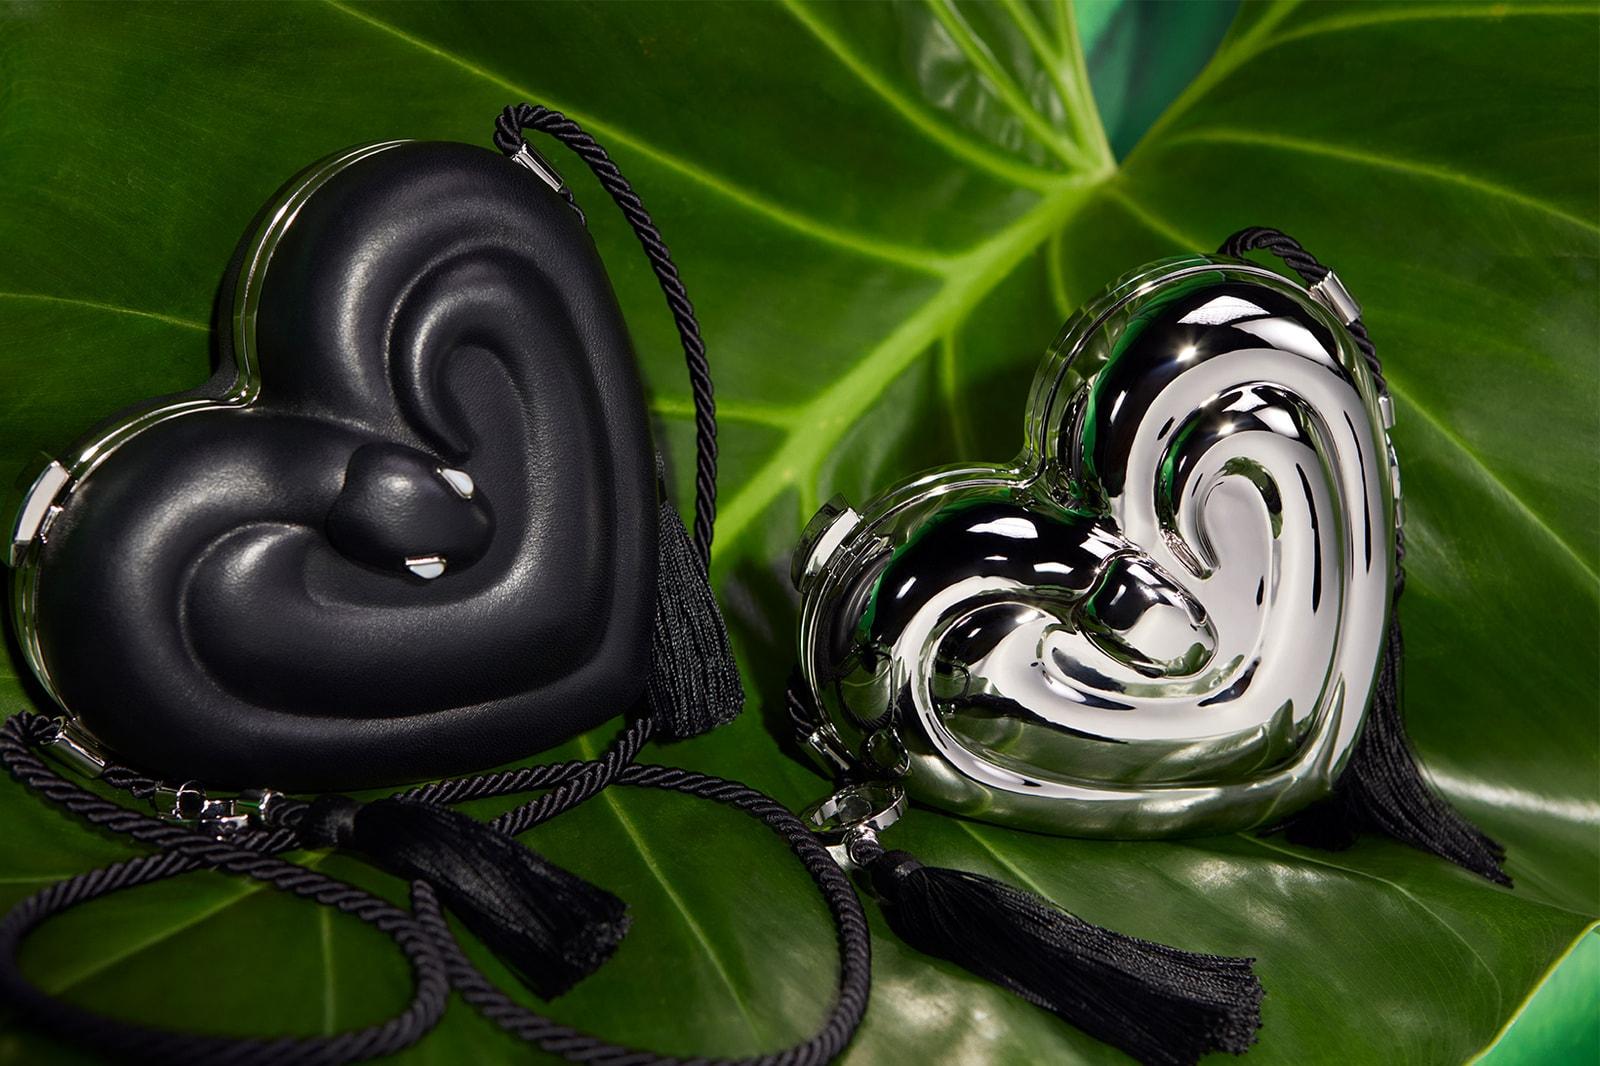 ambush bvlgari collaboration serpenti bags clutches wallets xiao wen ju bella hadid ellen rosa through the eyes of yoon